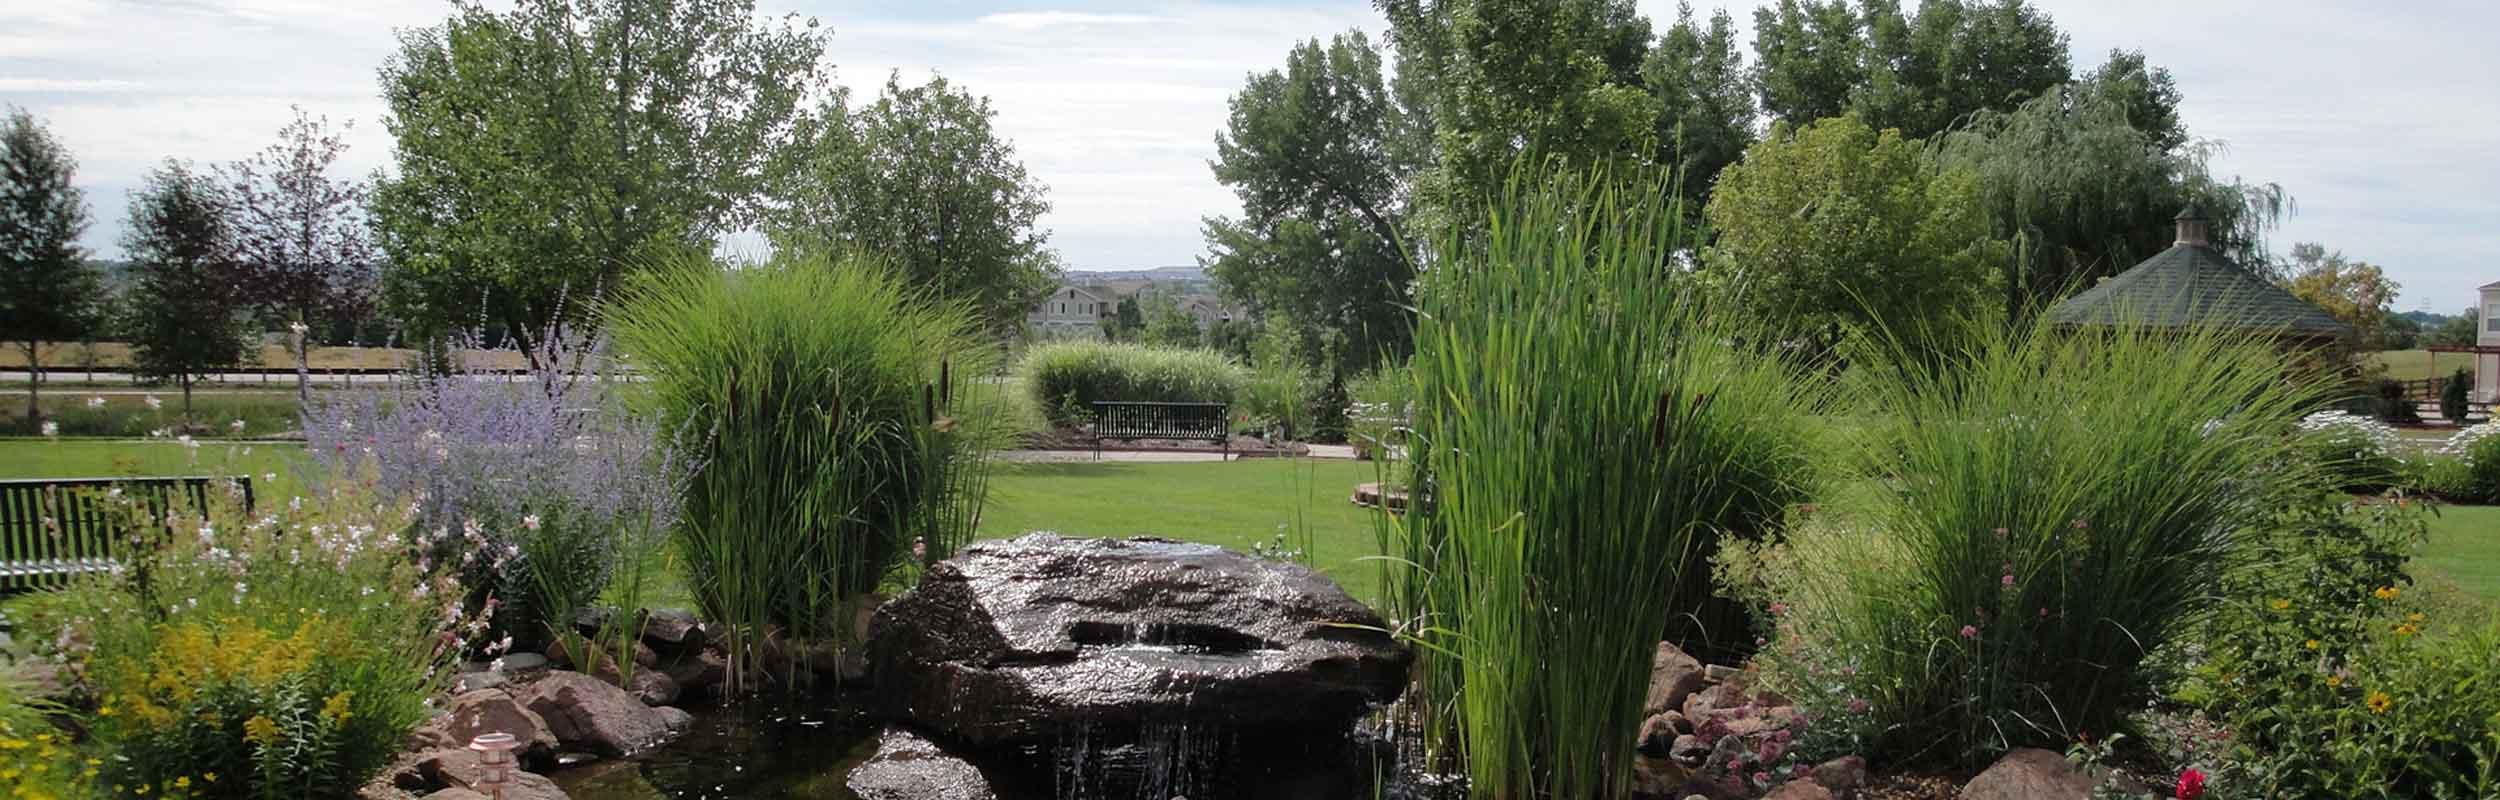 Enjoy the Colorado lifestyle at the Gardens at Columbine